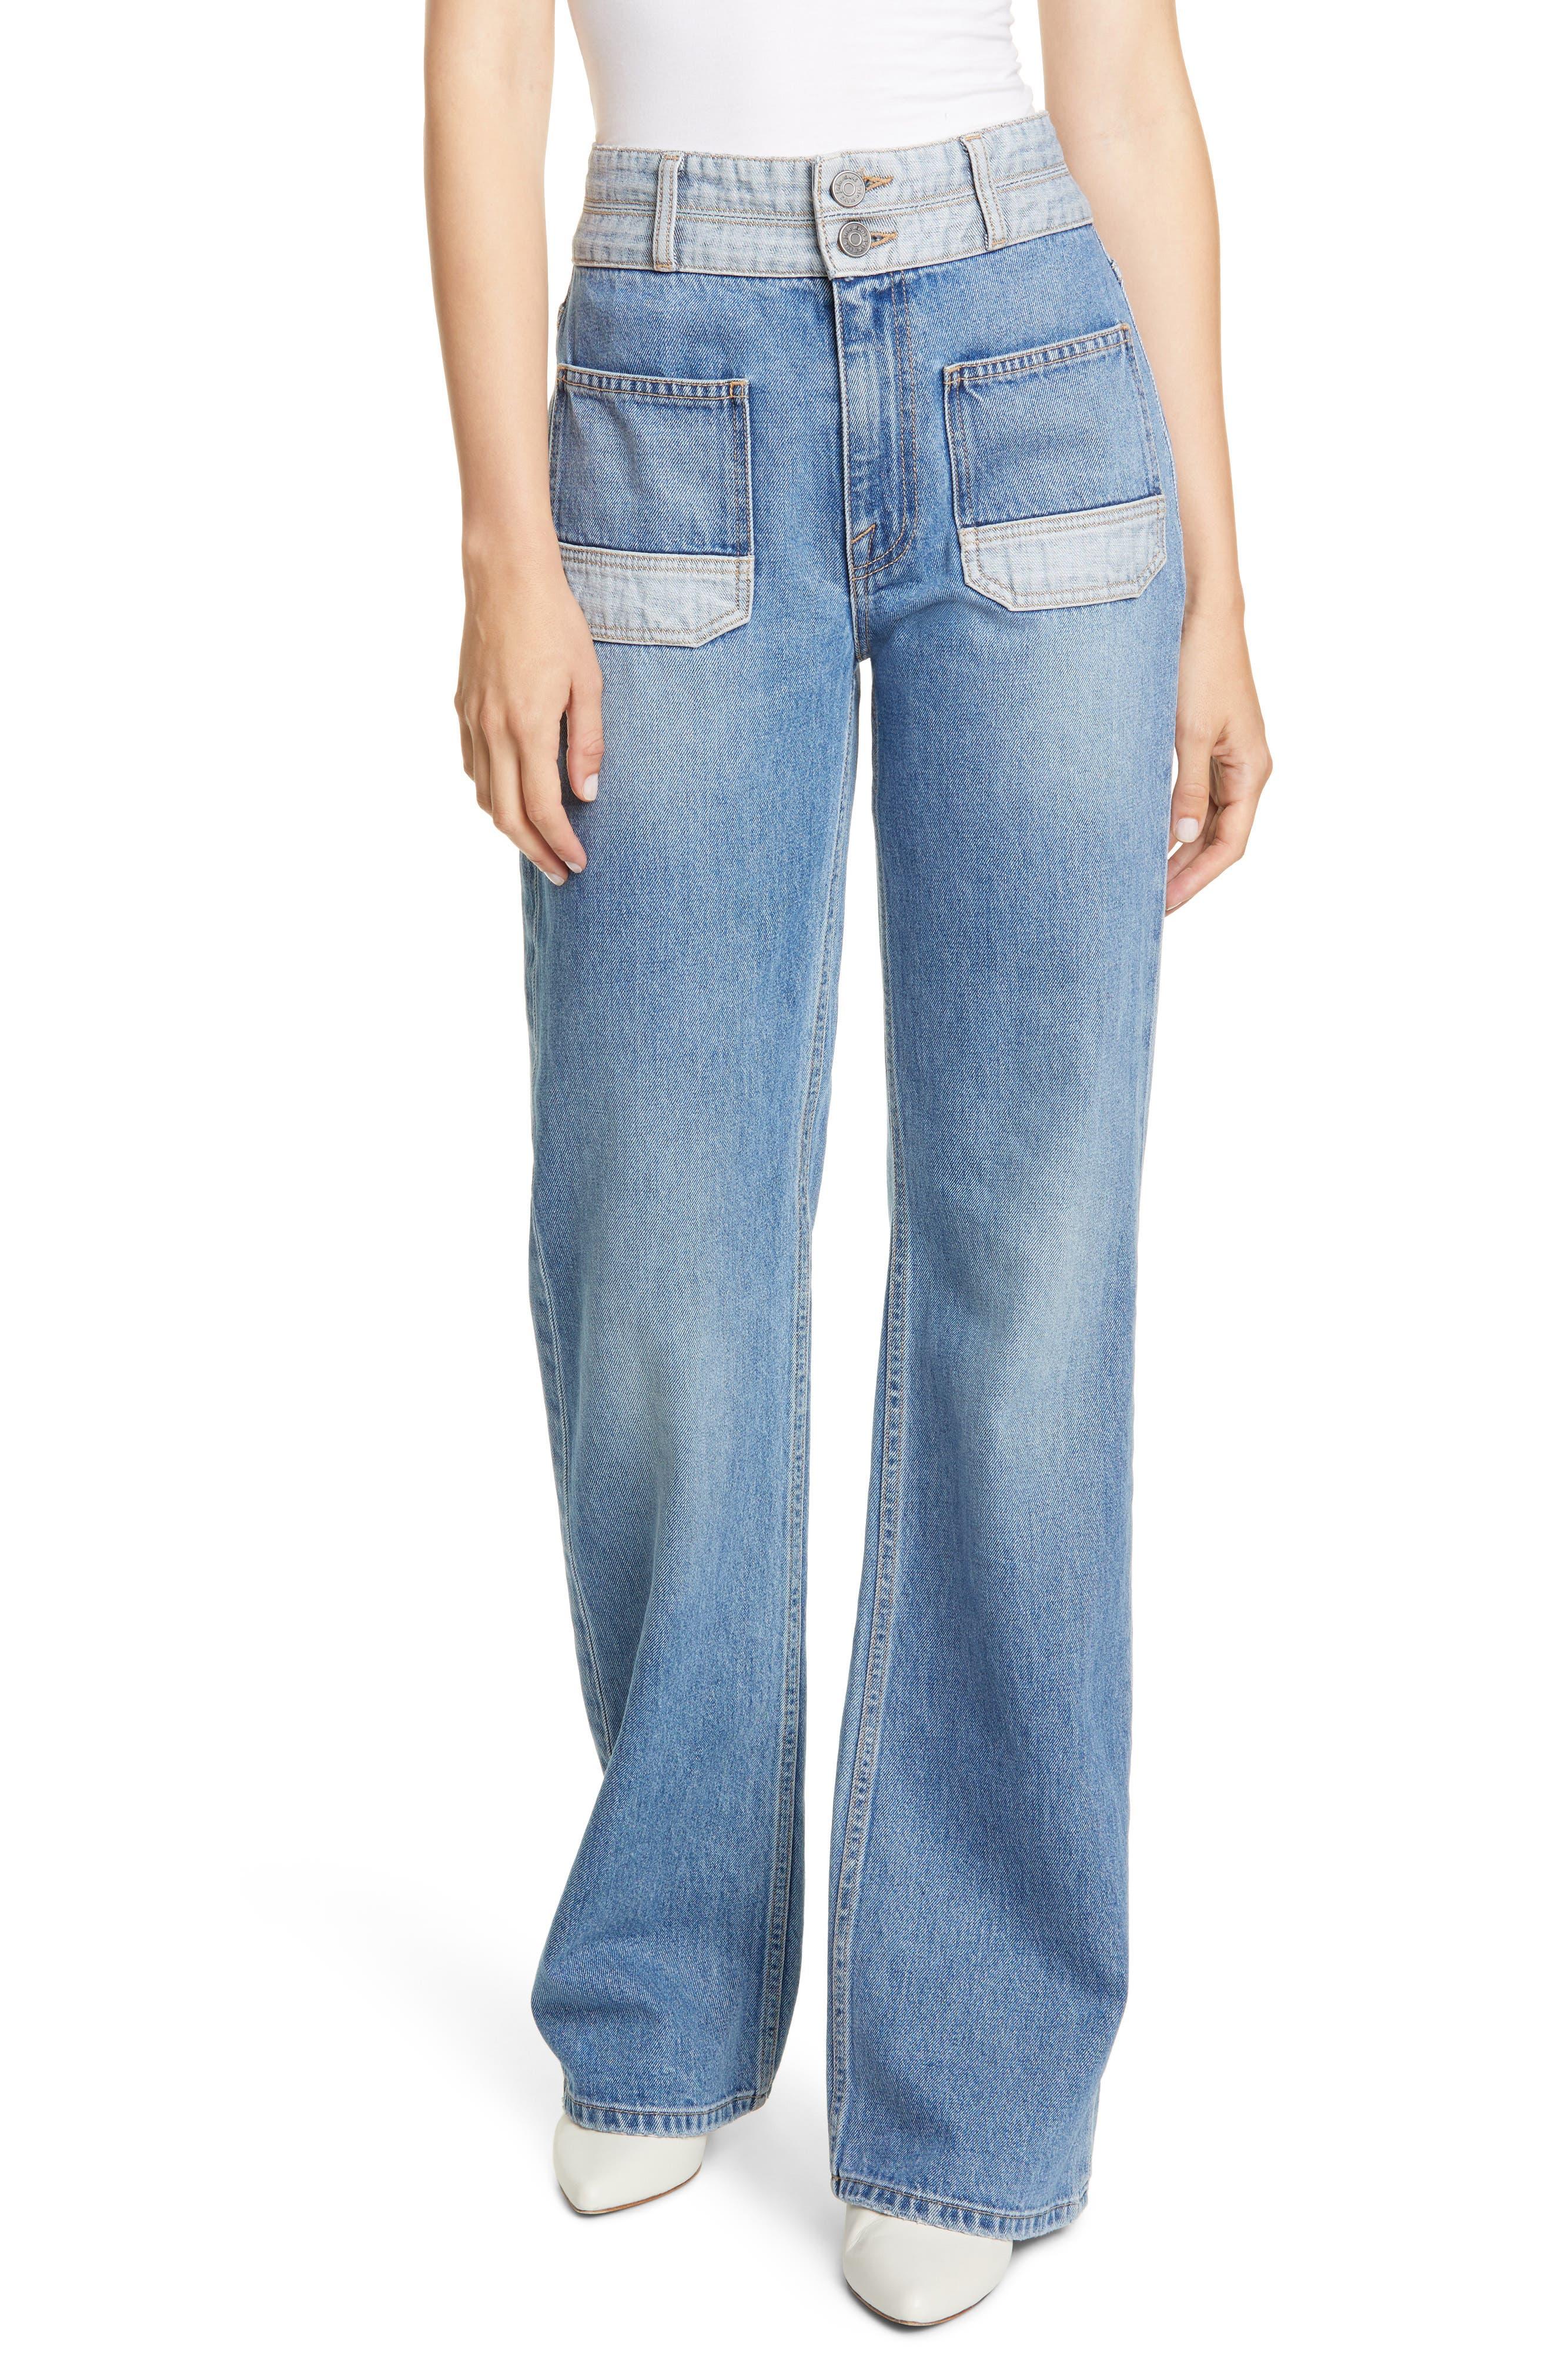 Joie Jeans Gabriel High Waist Two-Tone Wide Leg Jeans